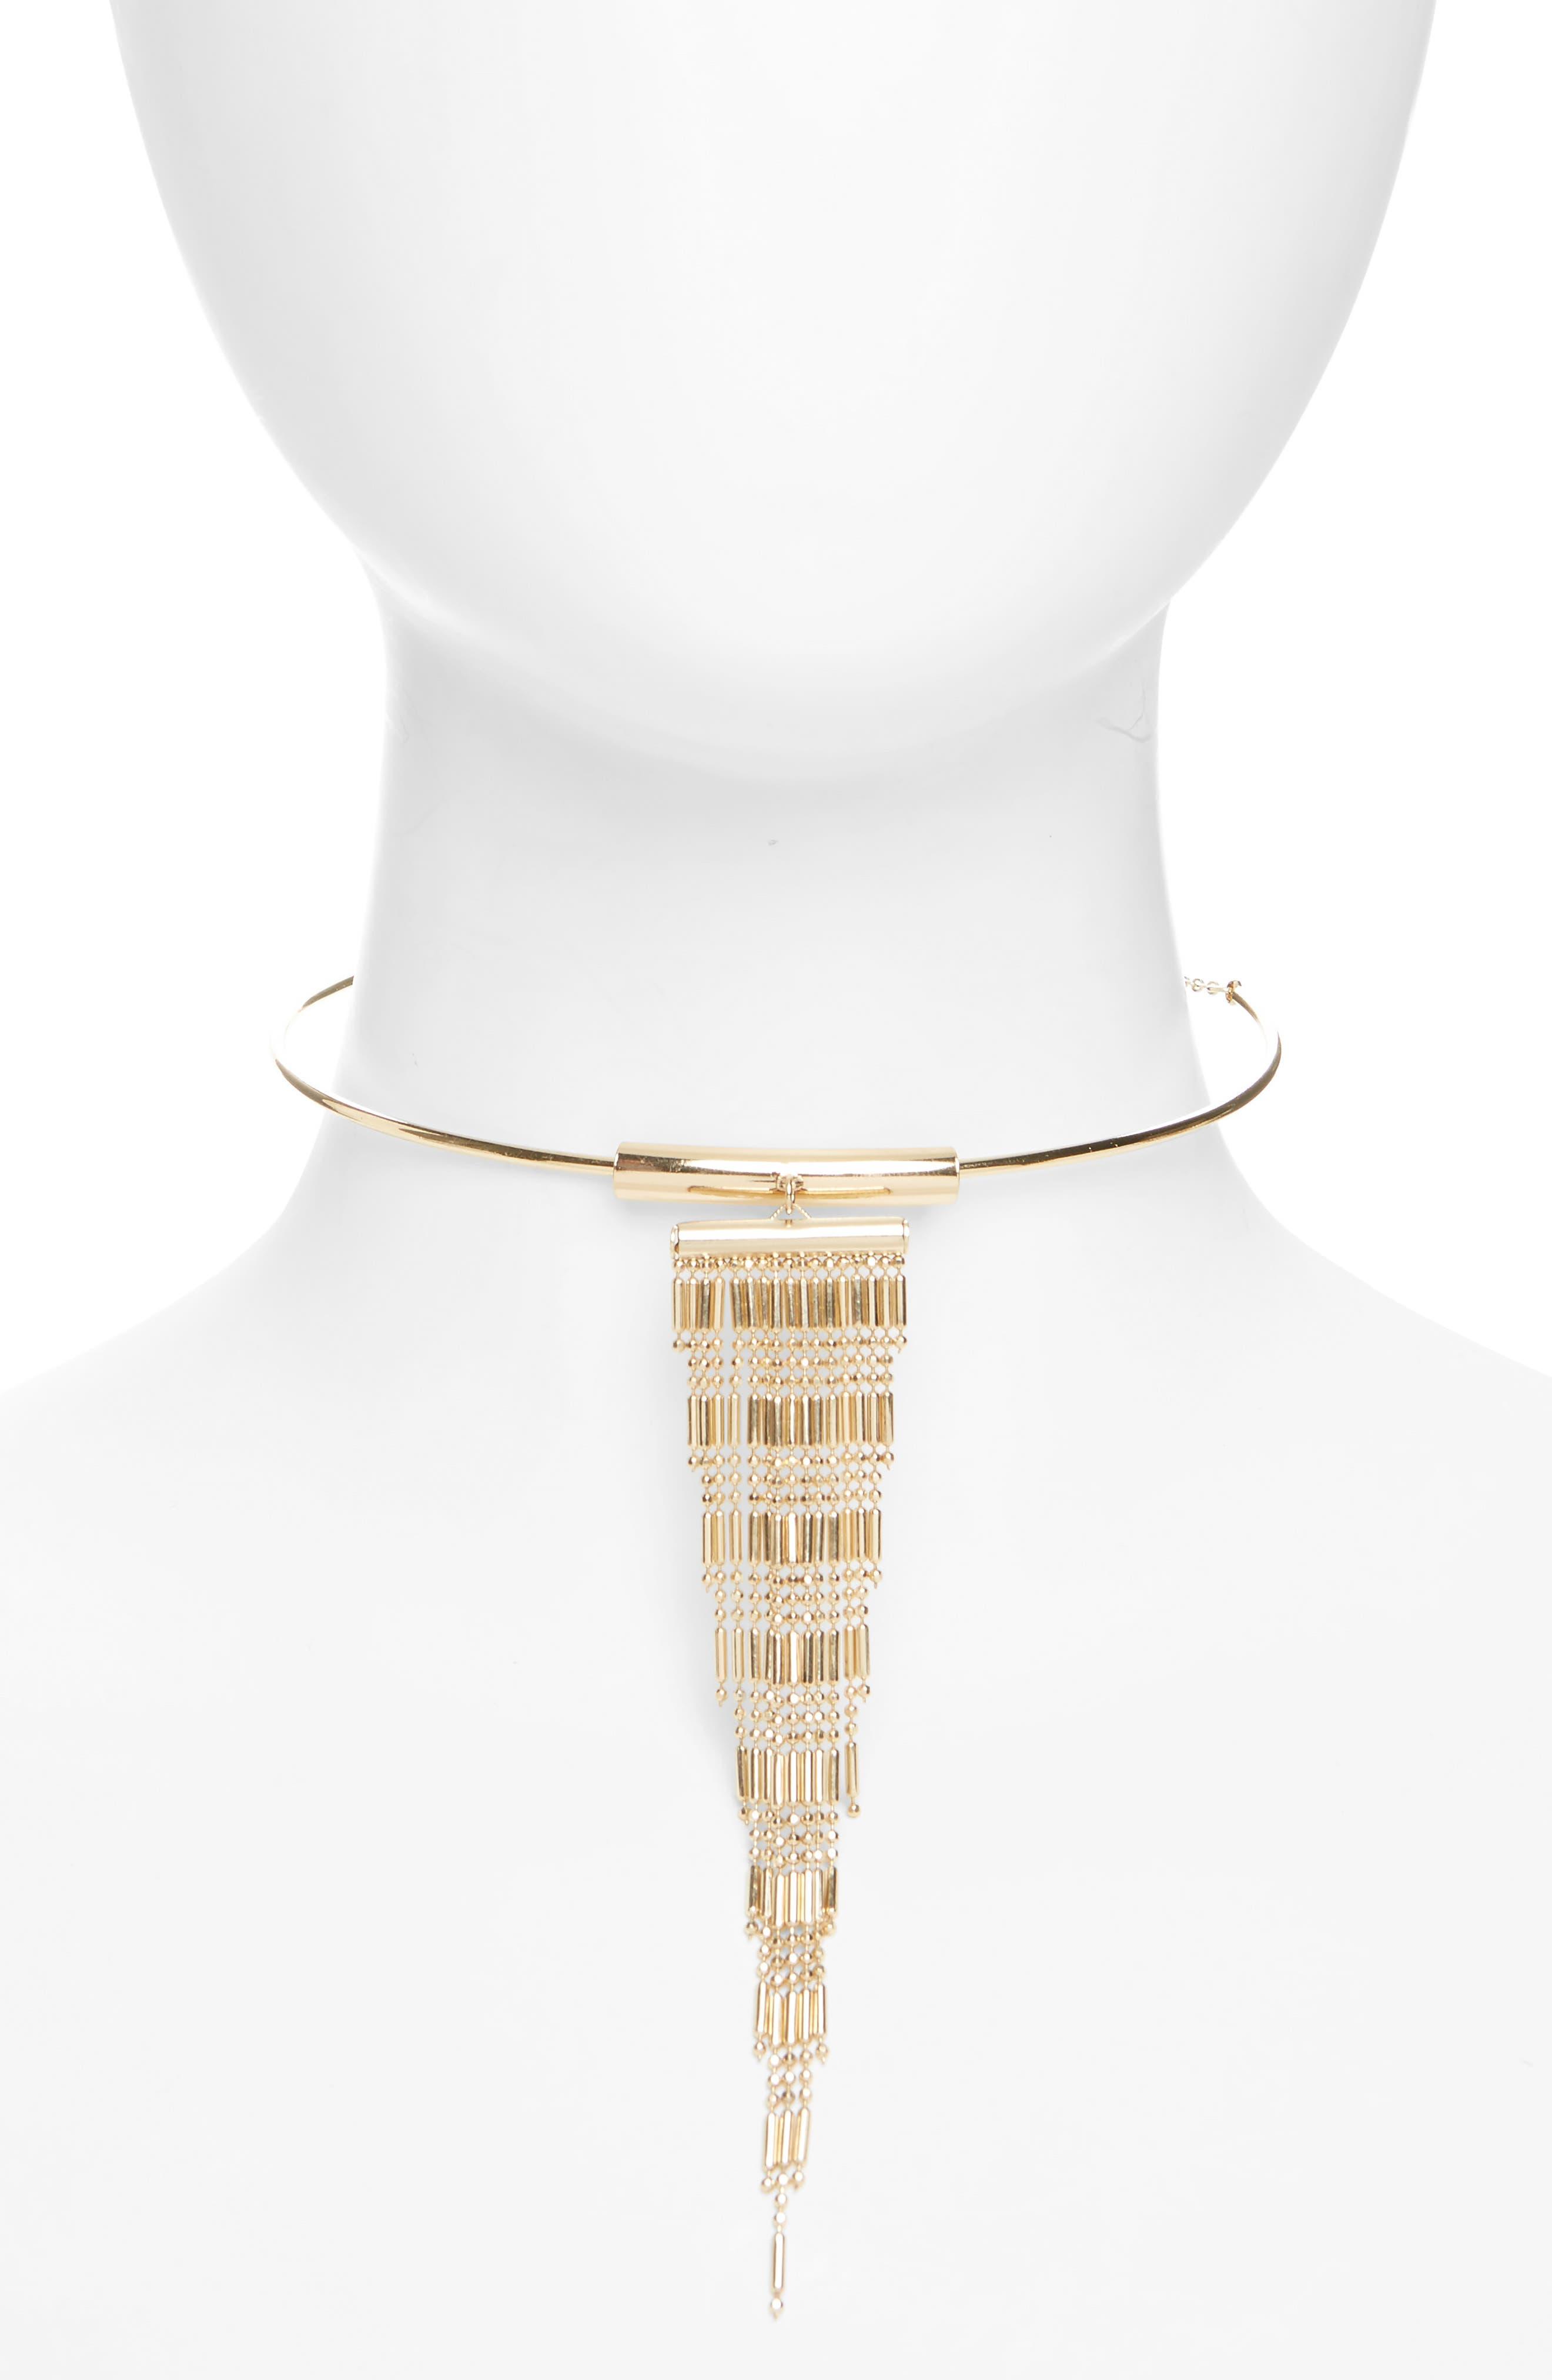 Alternate Image 1 Selected - Topshop Tassel Torq Choker Necklace